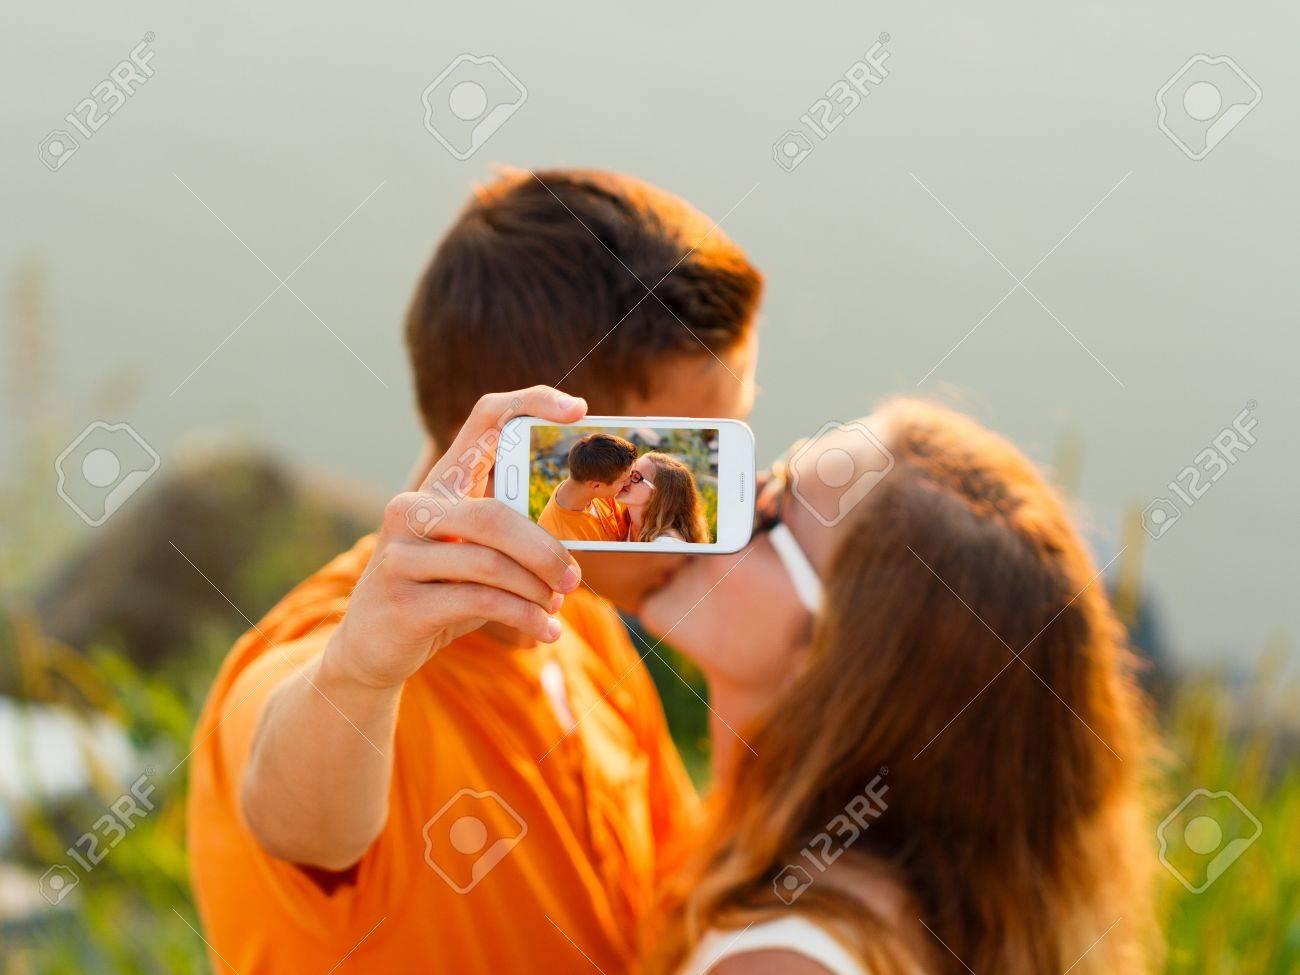 Teenager-Liebhaber